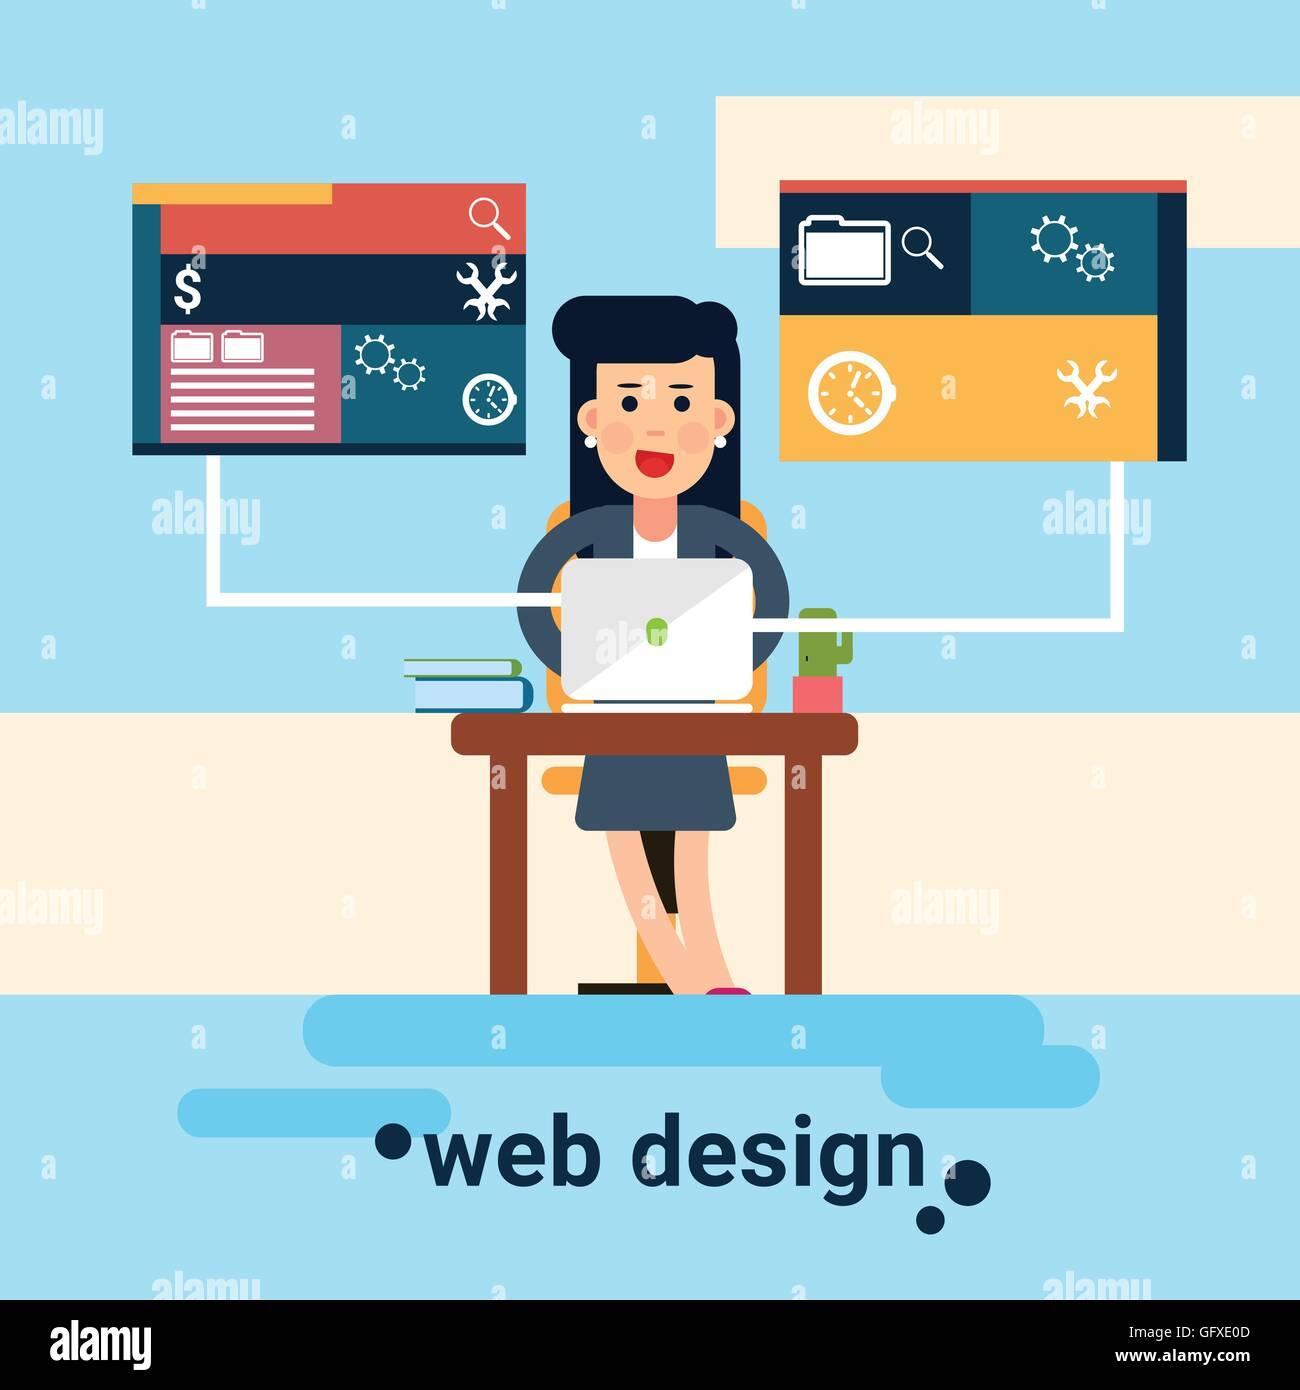 Woman Web Designer Workplace Graphic Design Background Stock Vector Image Art Alamy